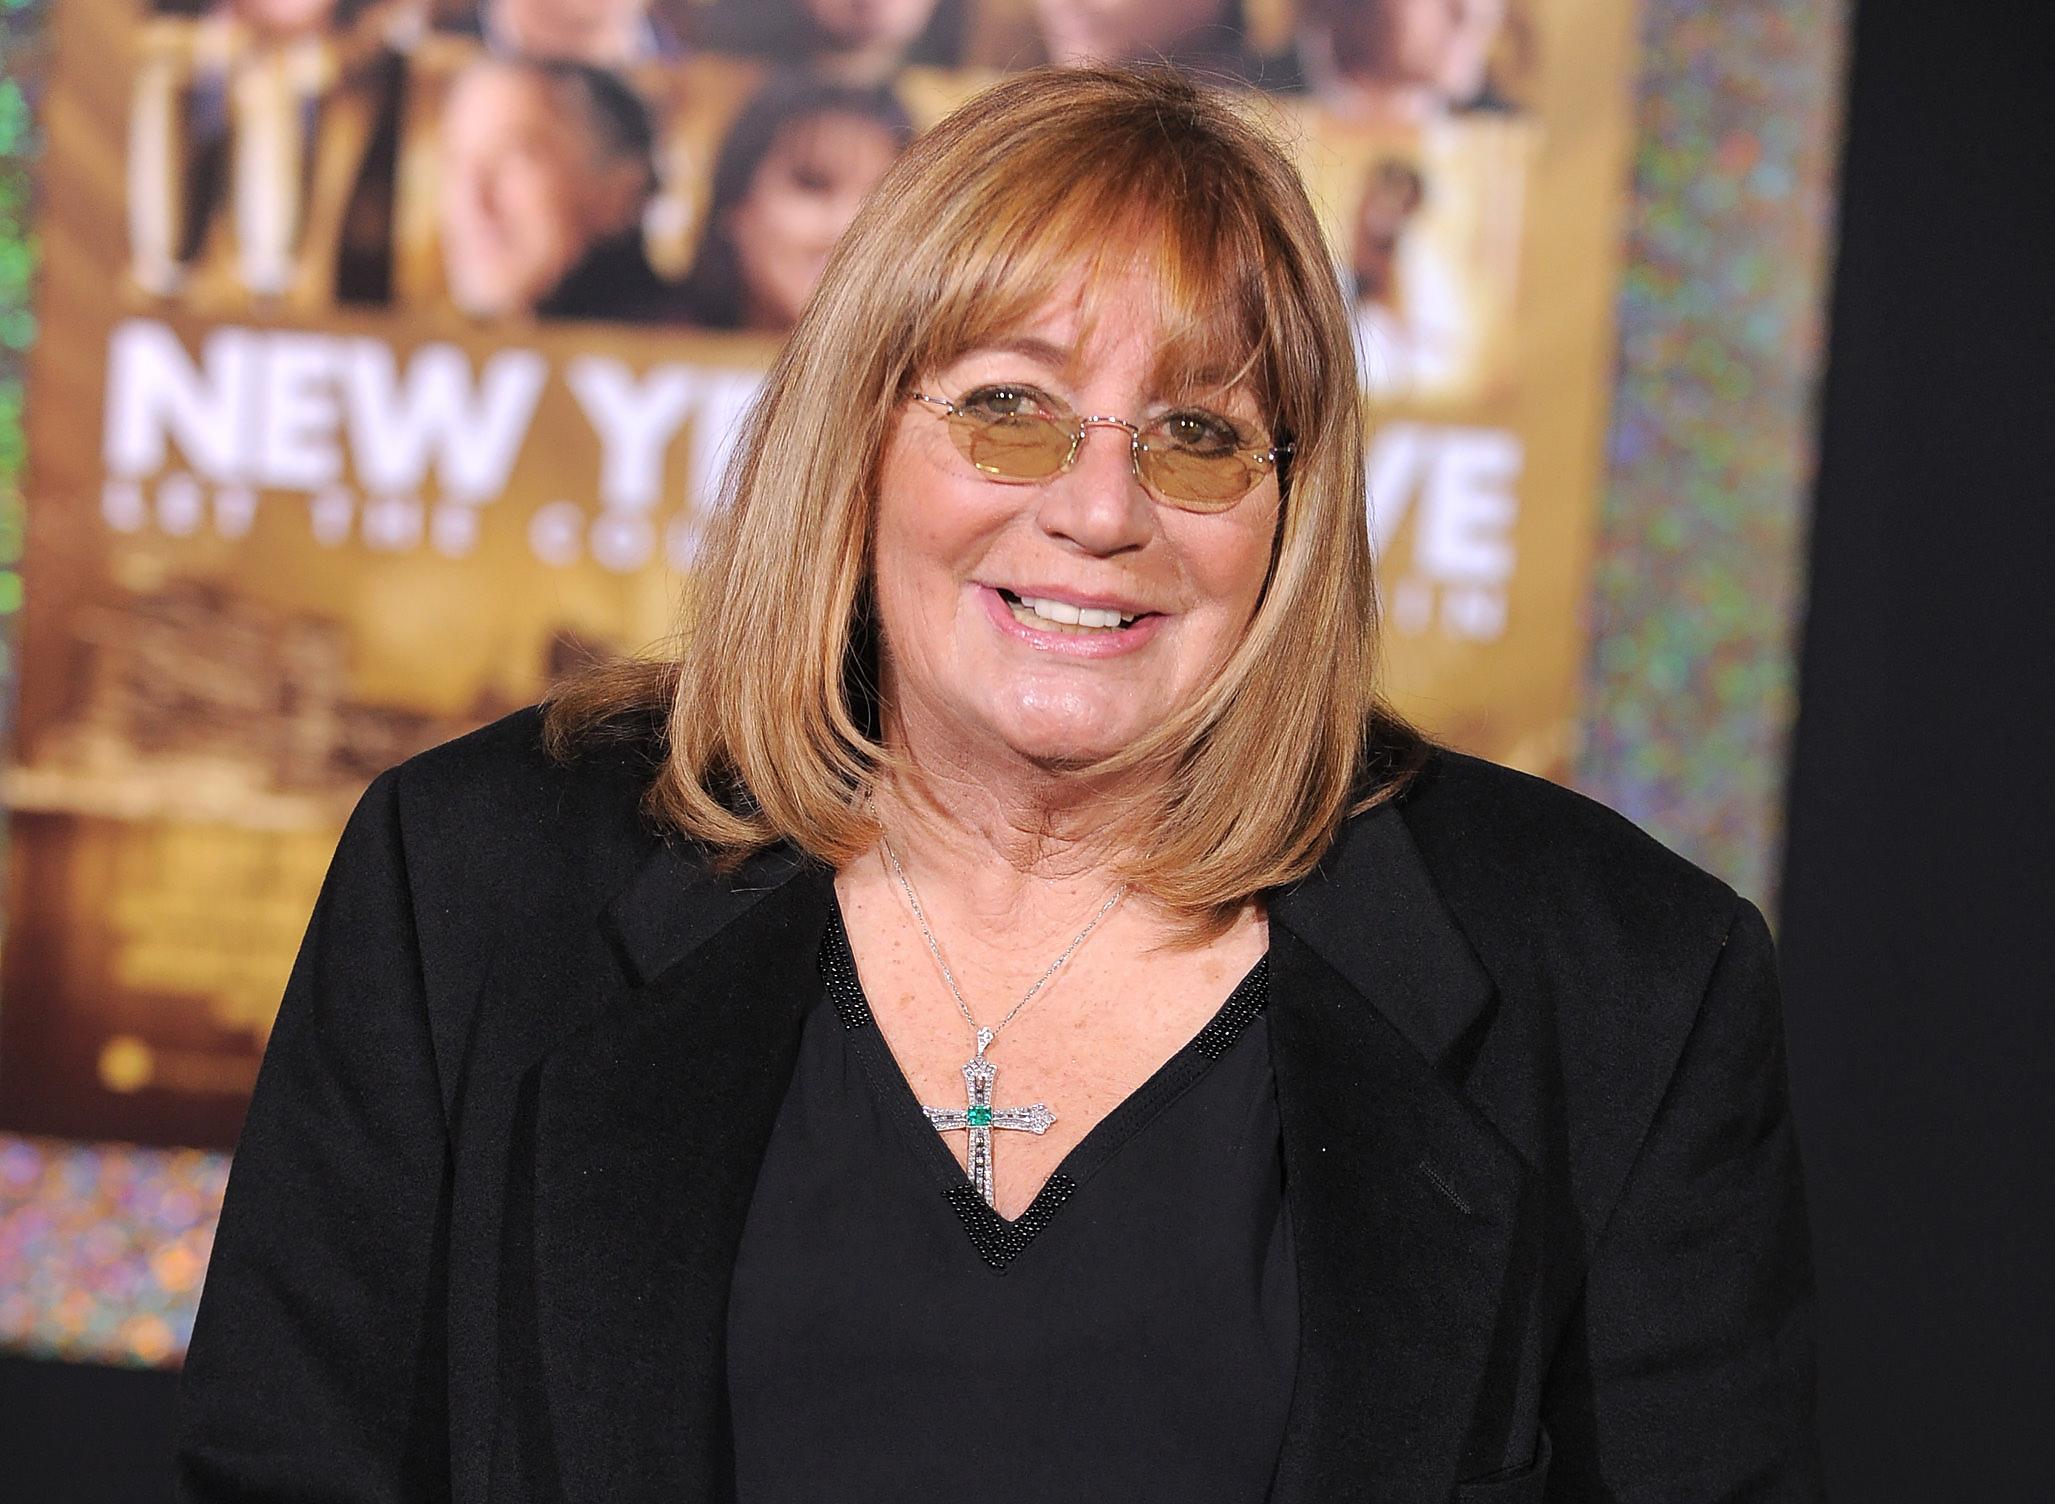 Penny Marshall, ovvero Penelope Masciarelli, la regista e